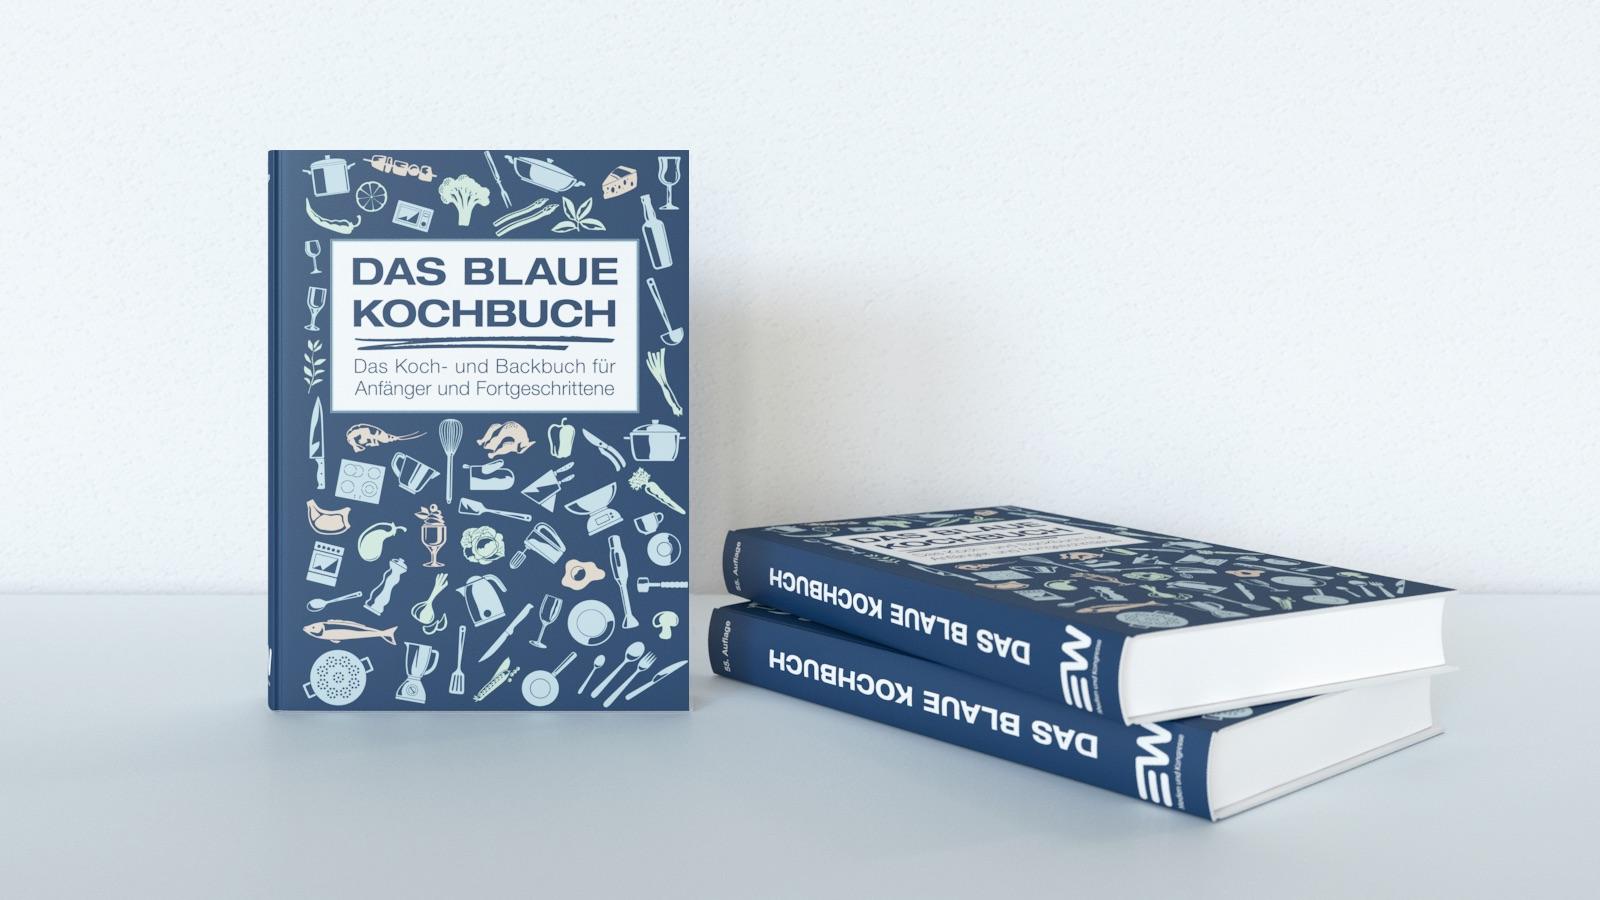 das blaue kochbuch das grundkochbuch f r anf nger und fortgeschrittene. Black Bedroom Furniture Sets. Home Design Ideas